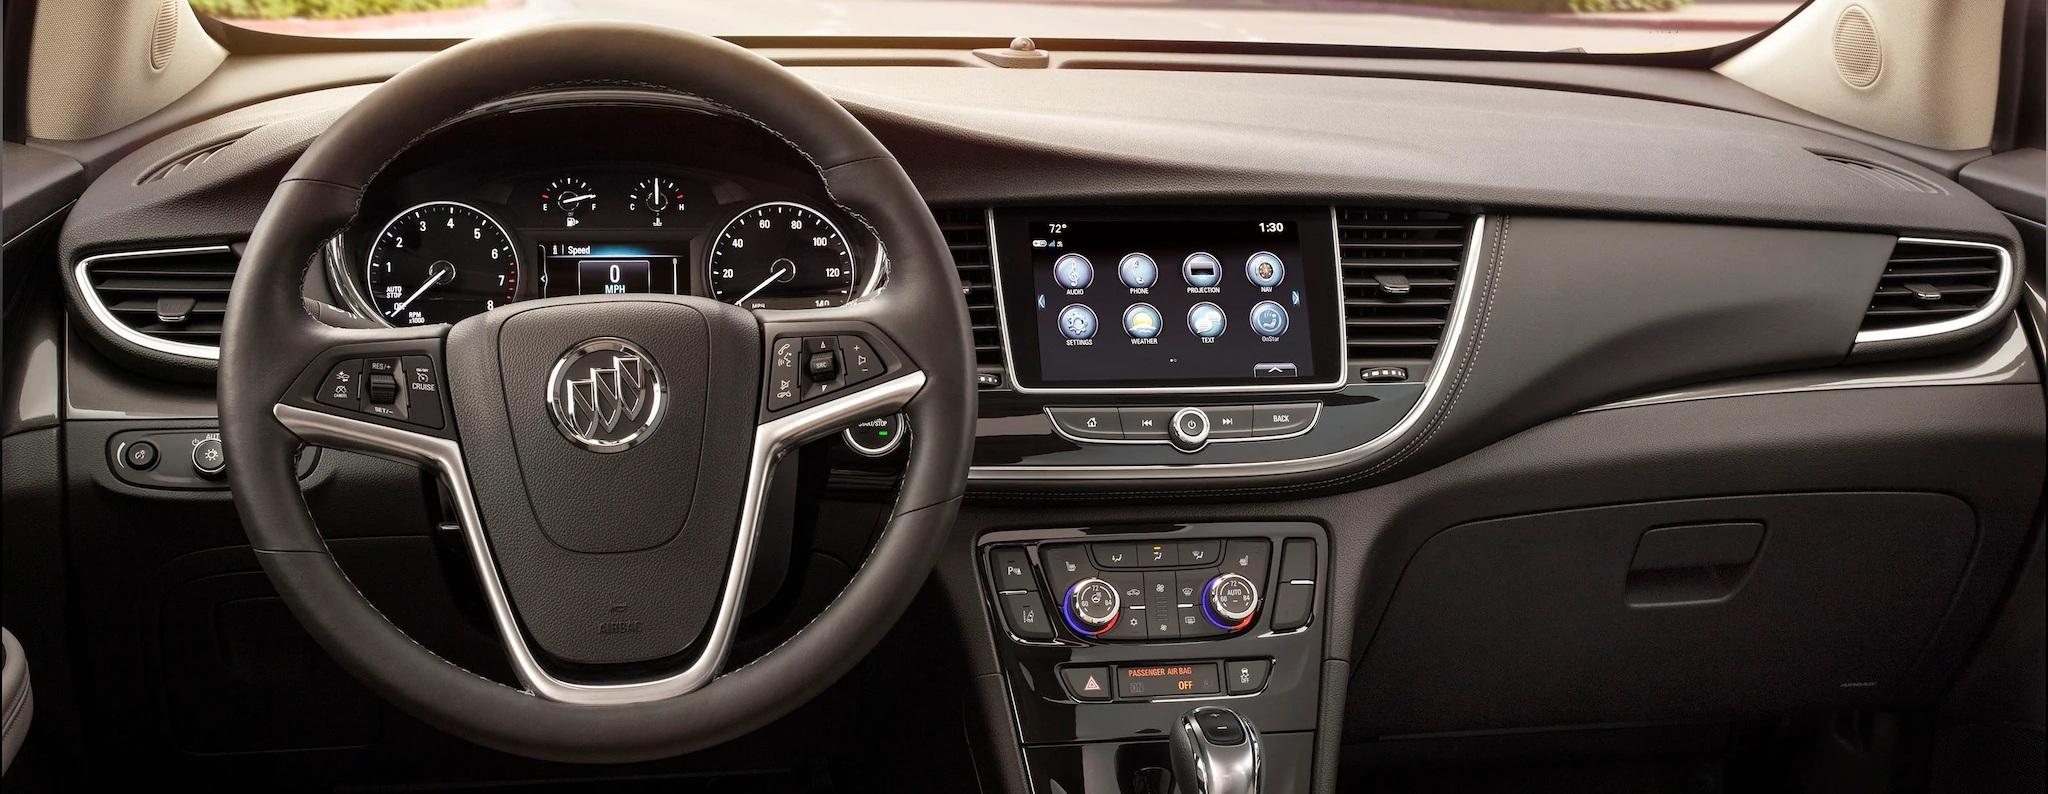 2020 Buick Encore For Sale In Schofield Wi